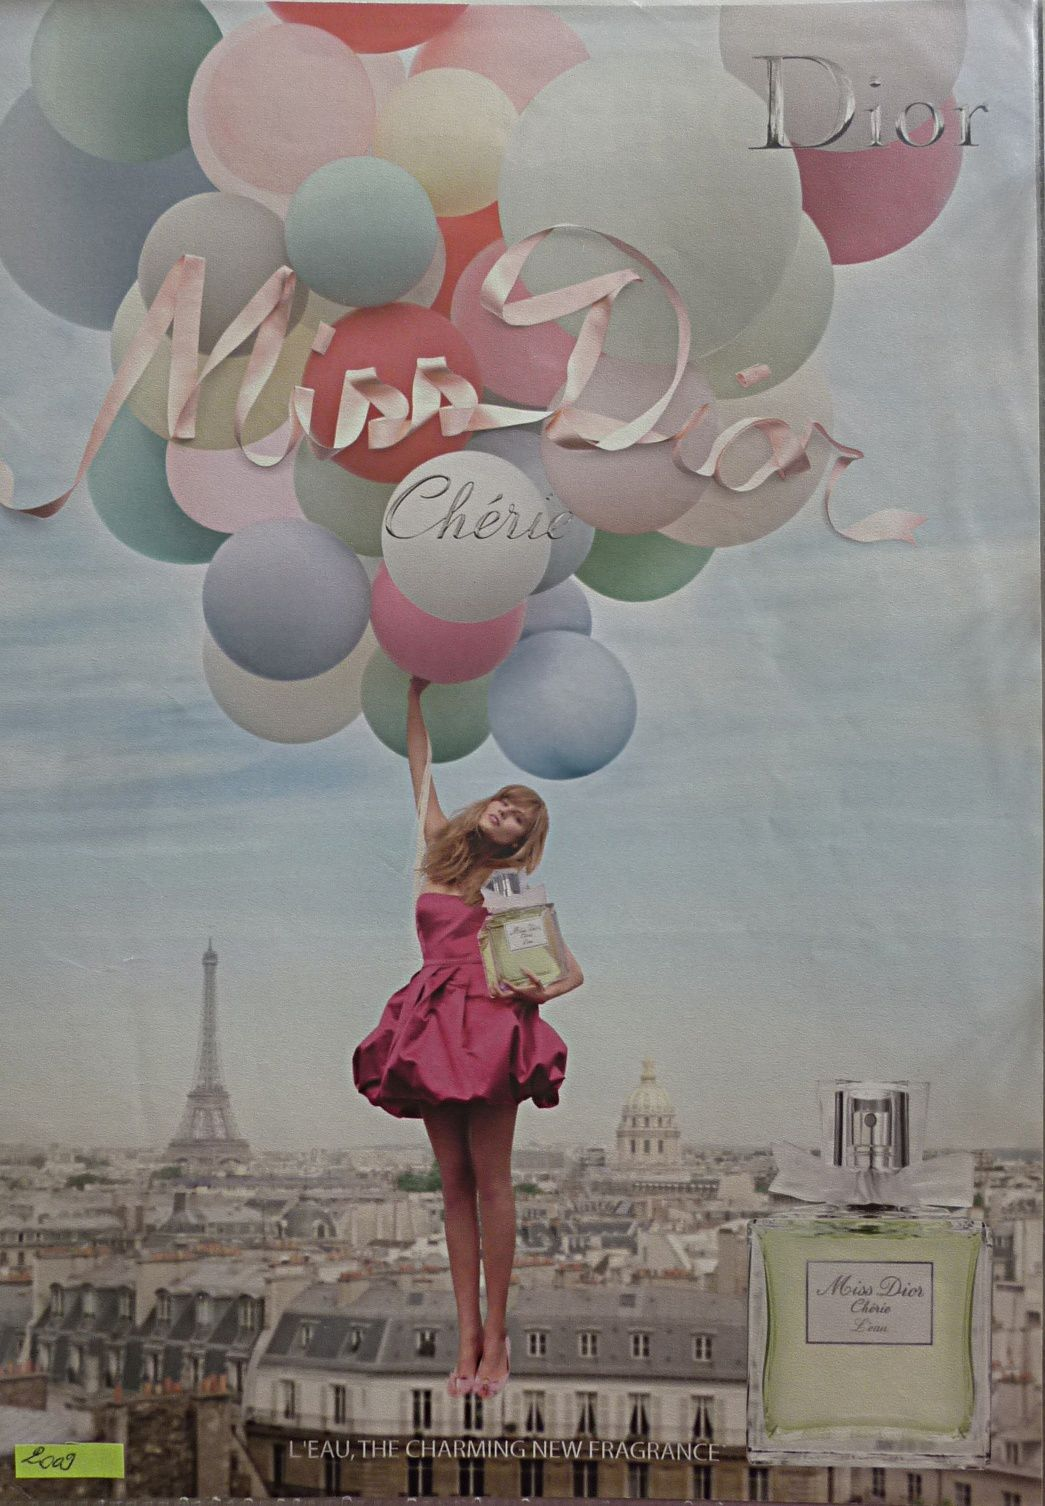 Miss Dior Chérie de Christian DIOR